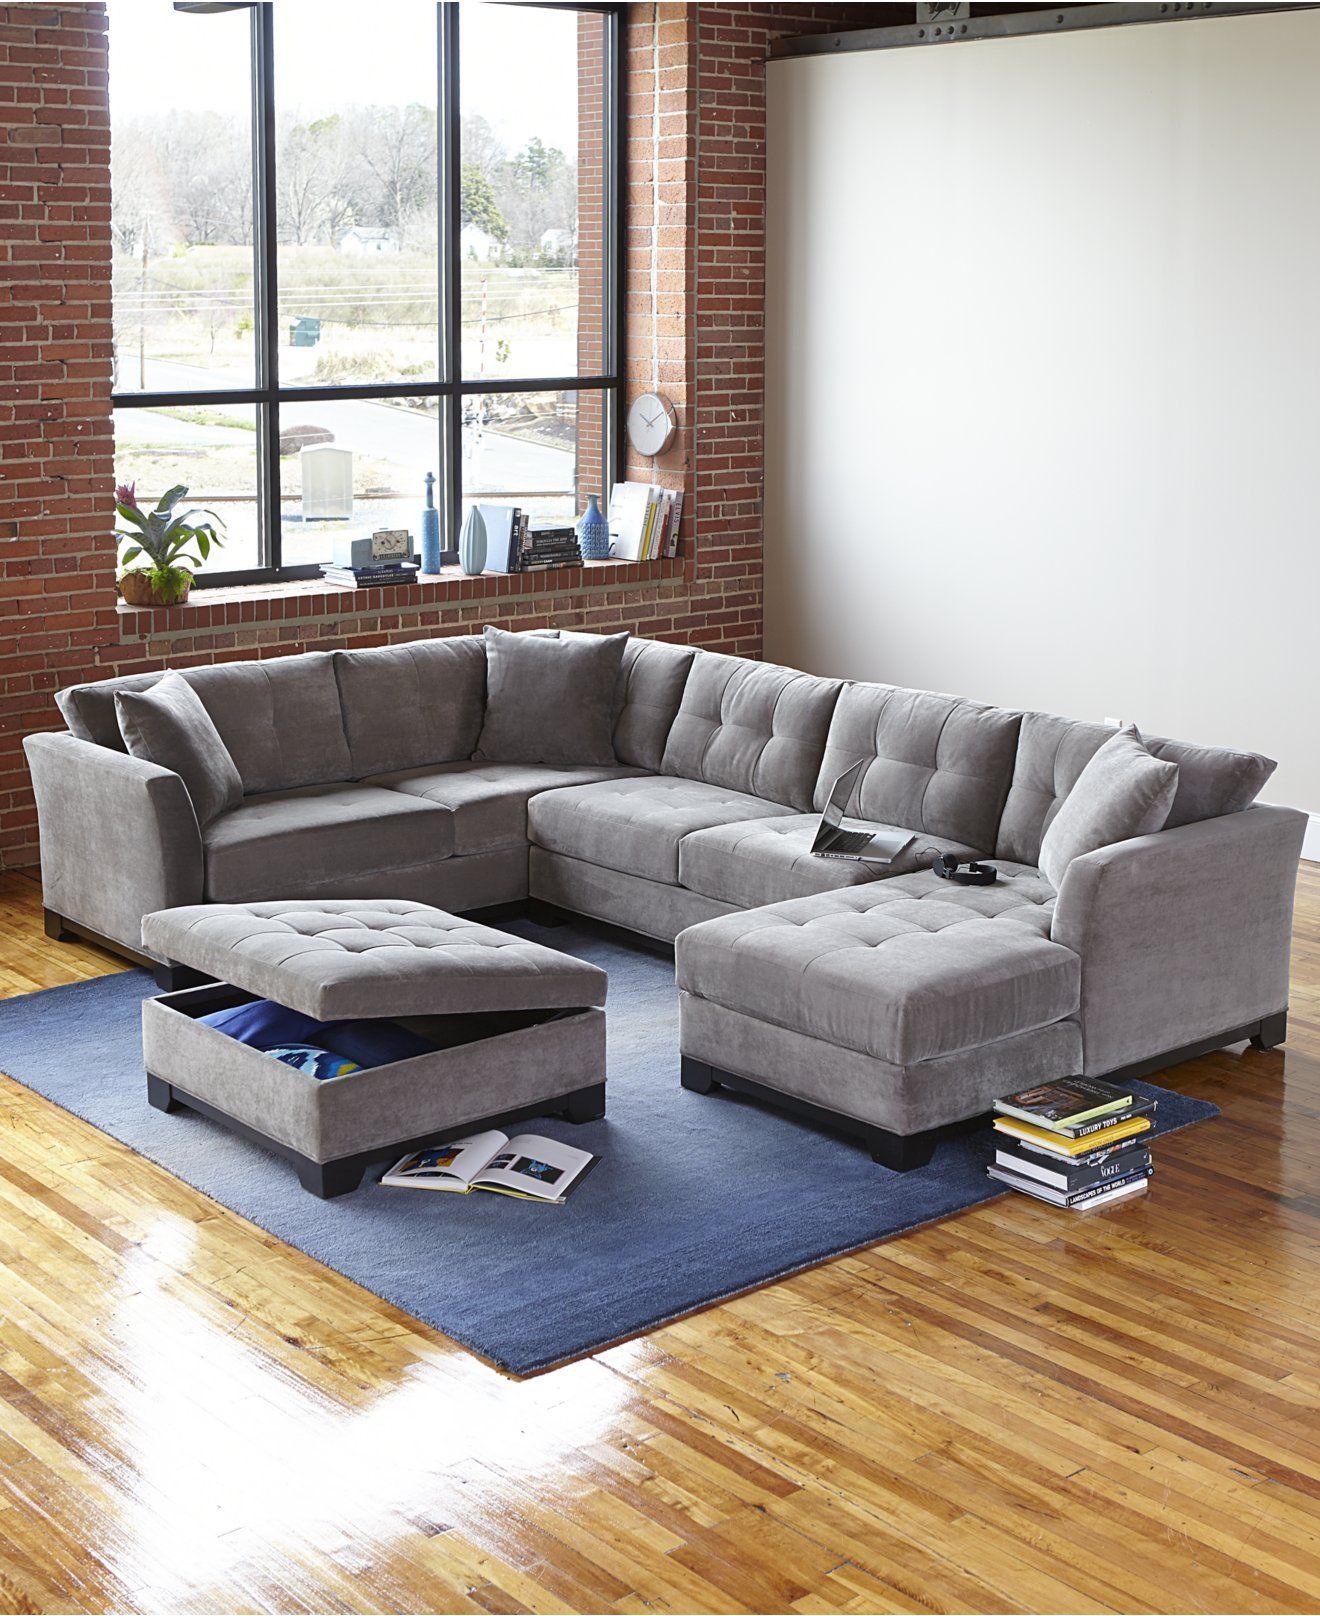 macys sectional sofa microfiber crumpet closeout elliot fabric 3 piece chaise